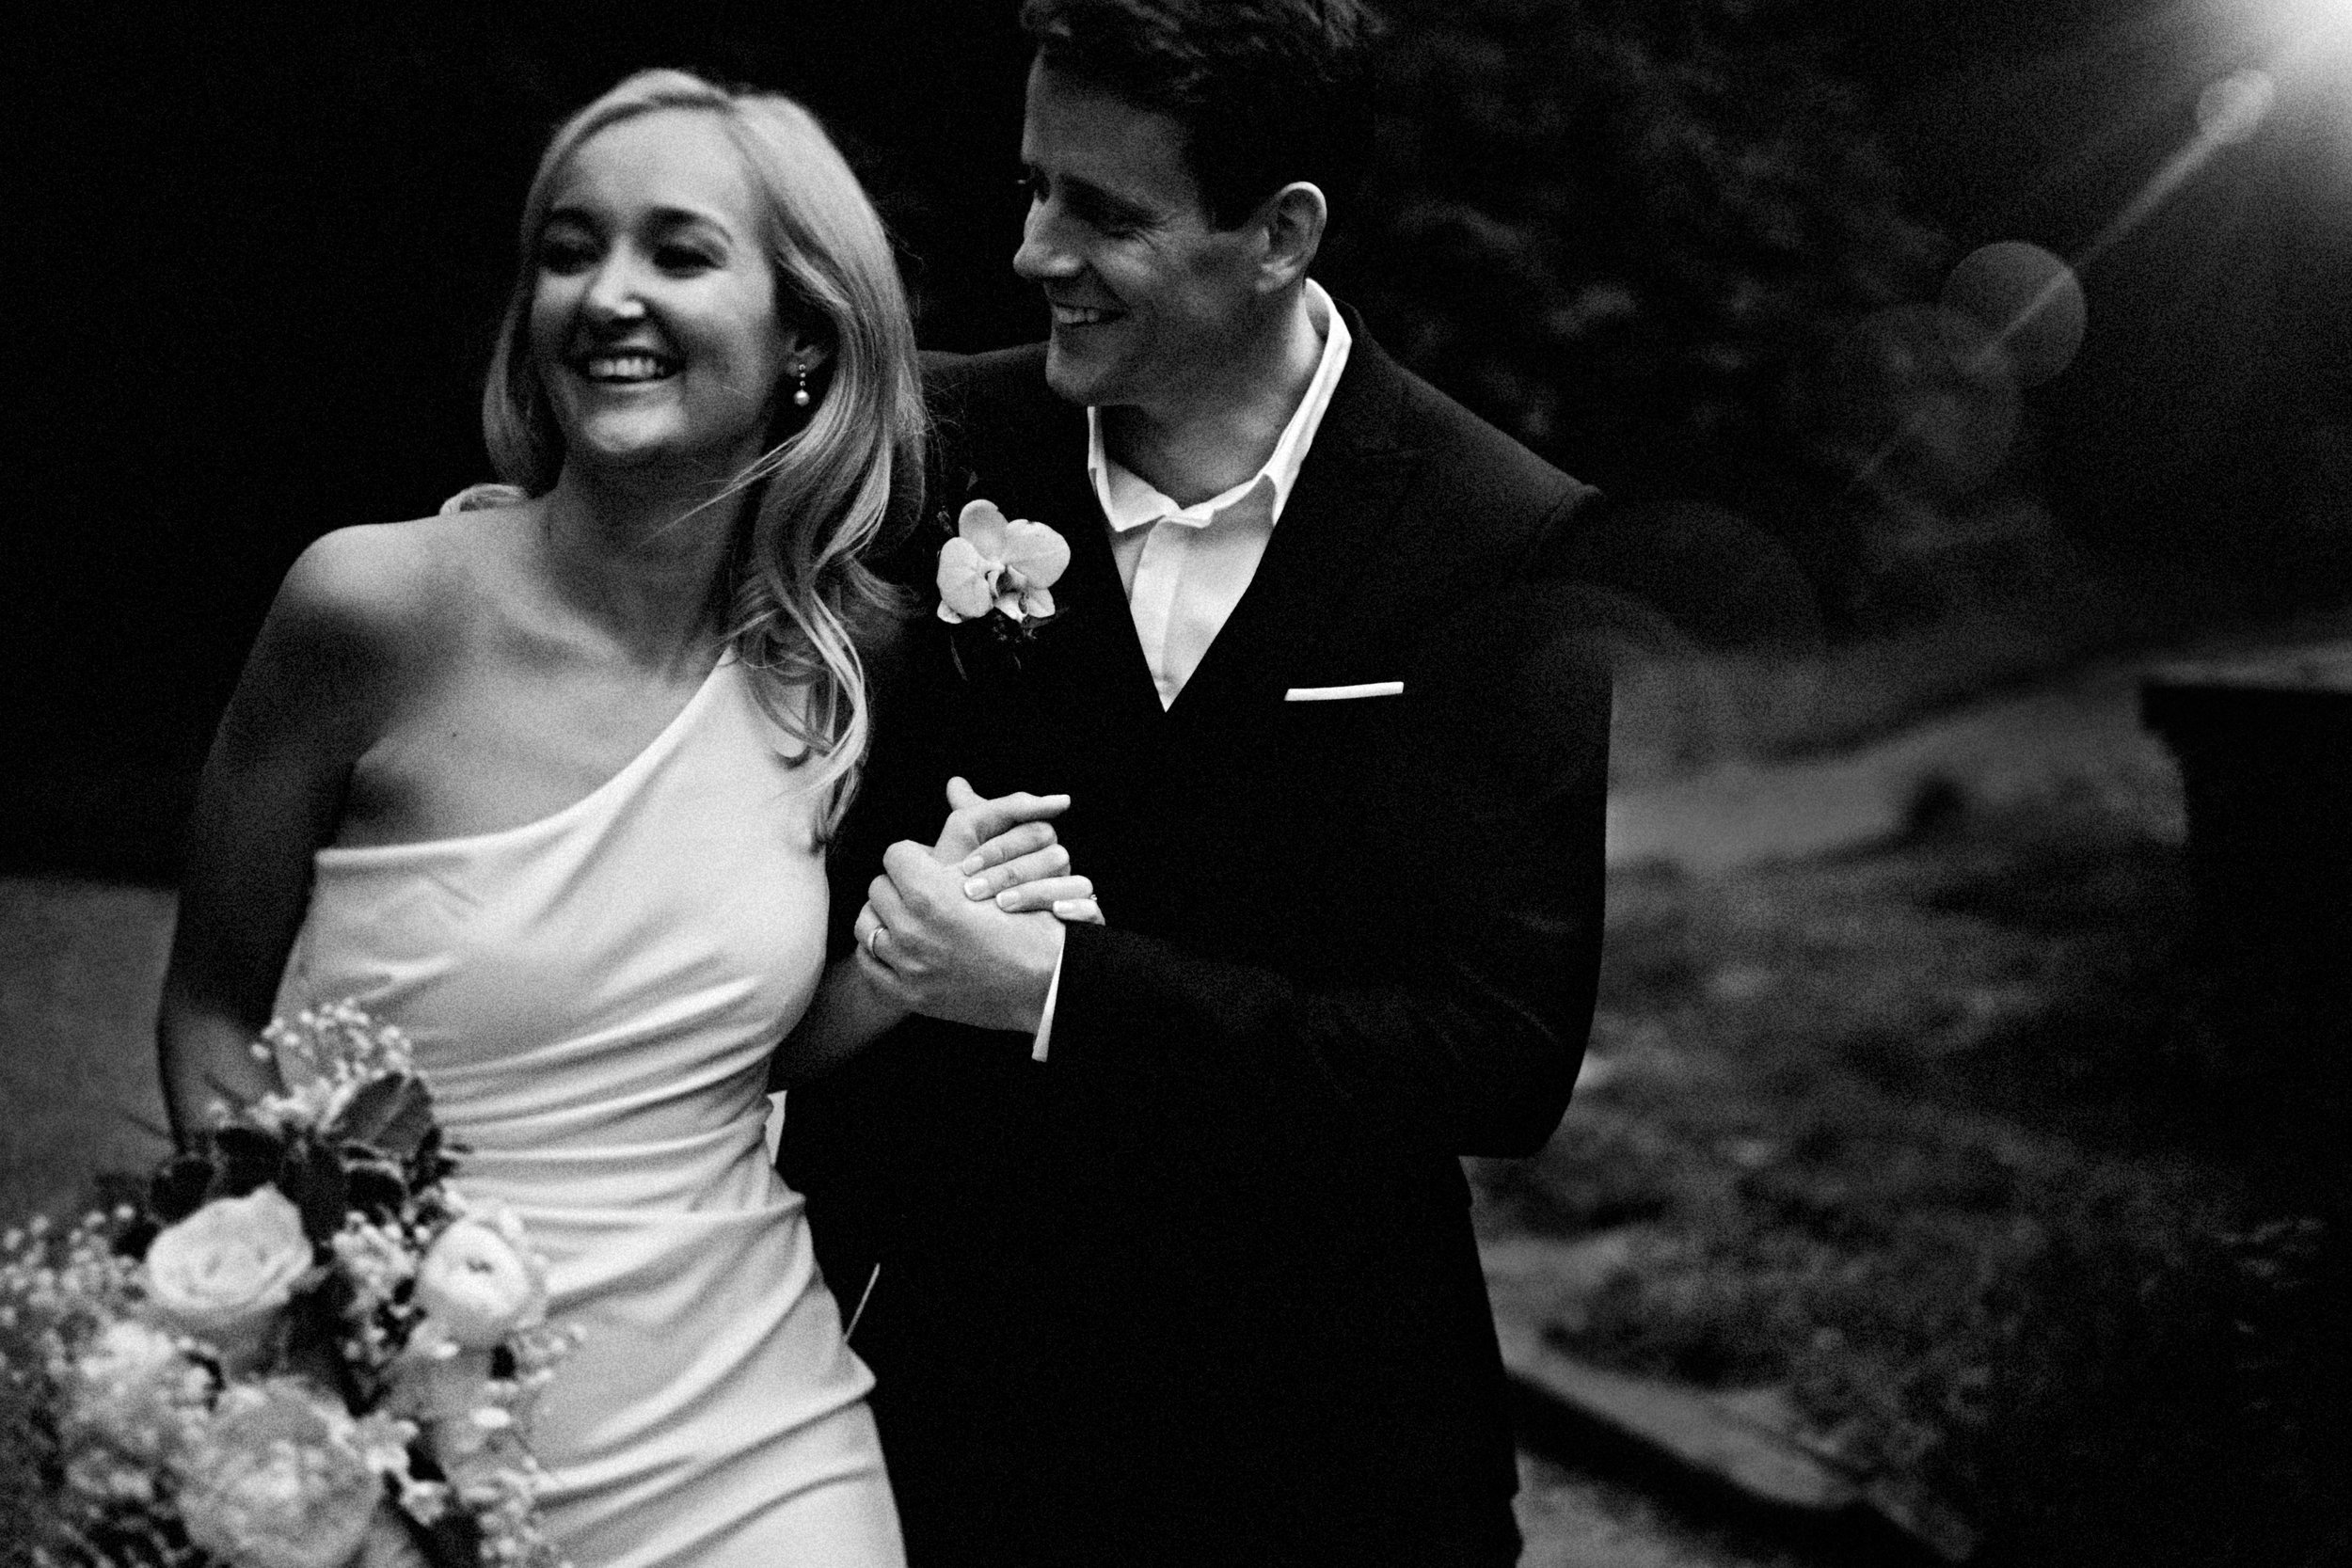 prestbury-cheshire-wedding-photographer-0031.JPG